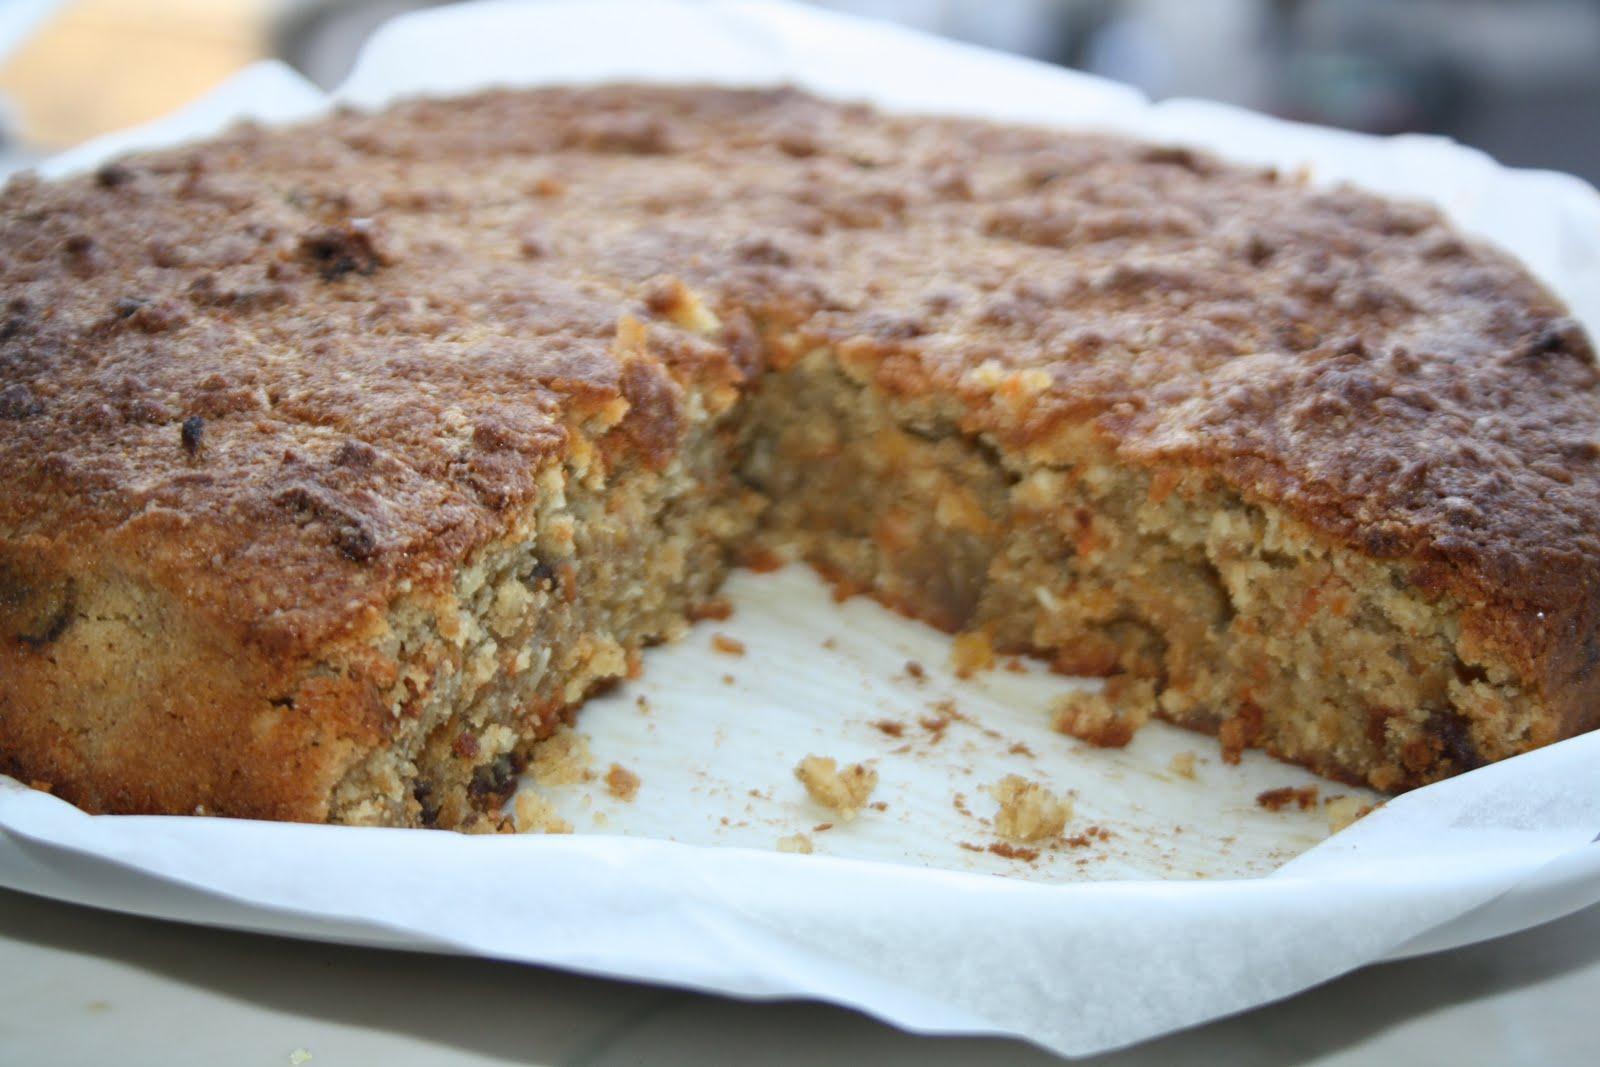 ... Passions: RECIPE: Flourless Carrot, Pistachio and Coconut Cake